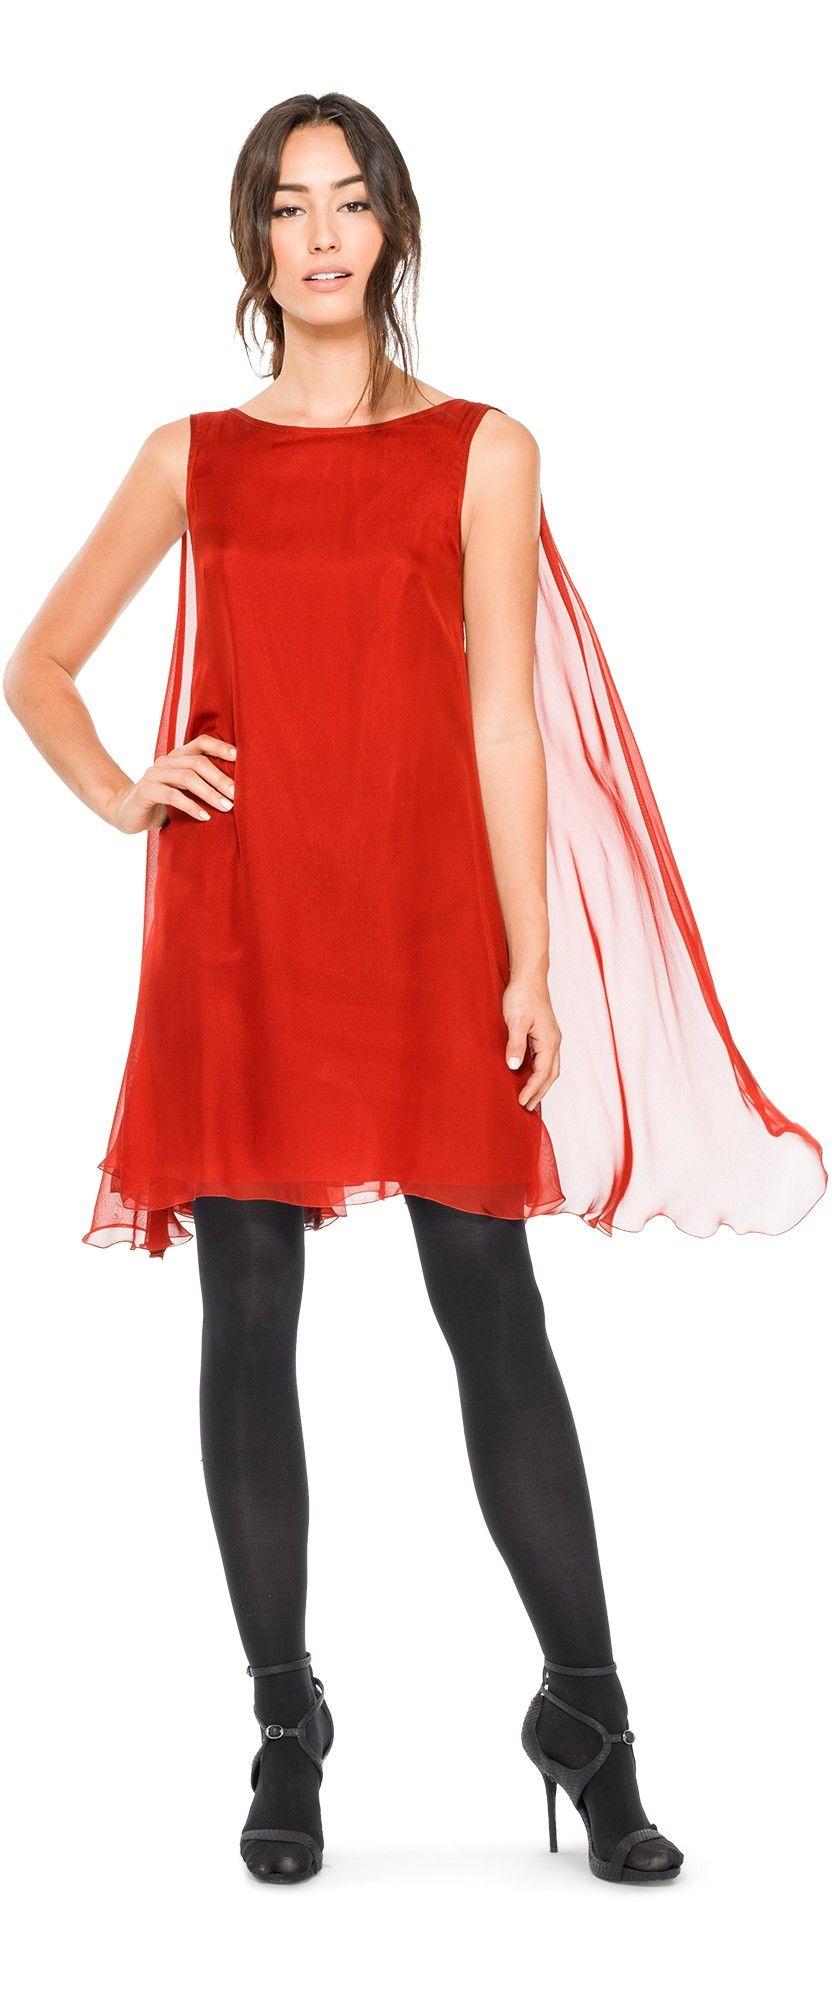 Silk mesh chiffon sleeveless dress ethereally draped with soft